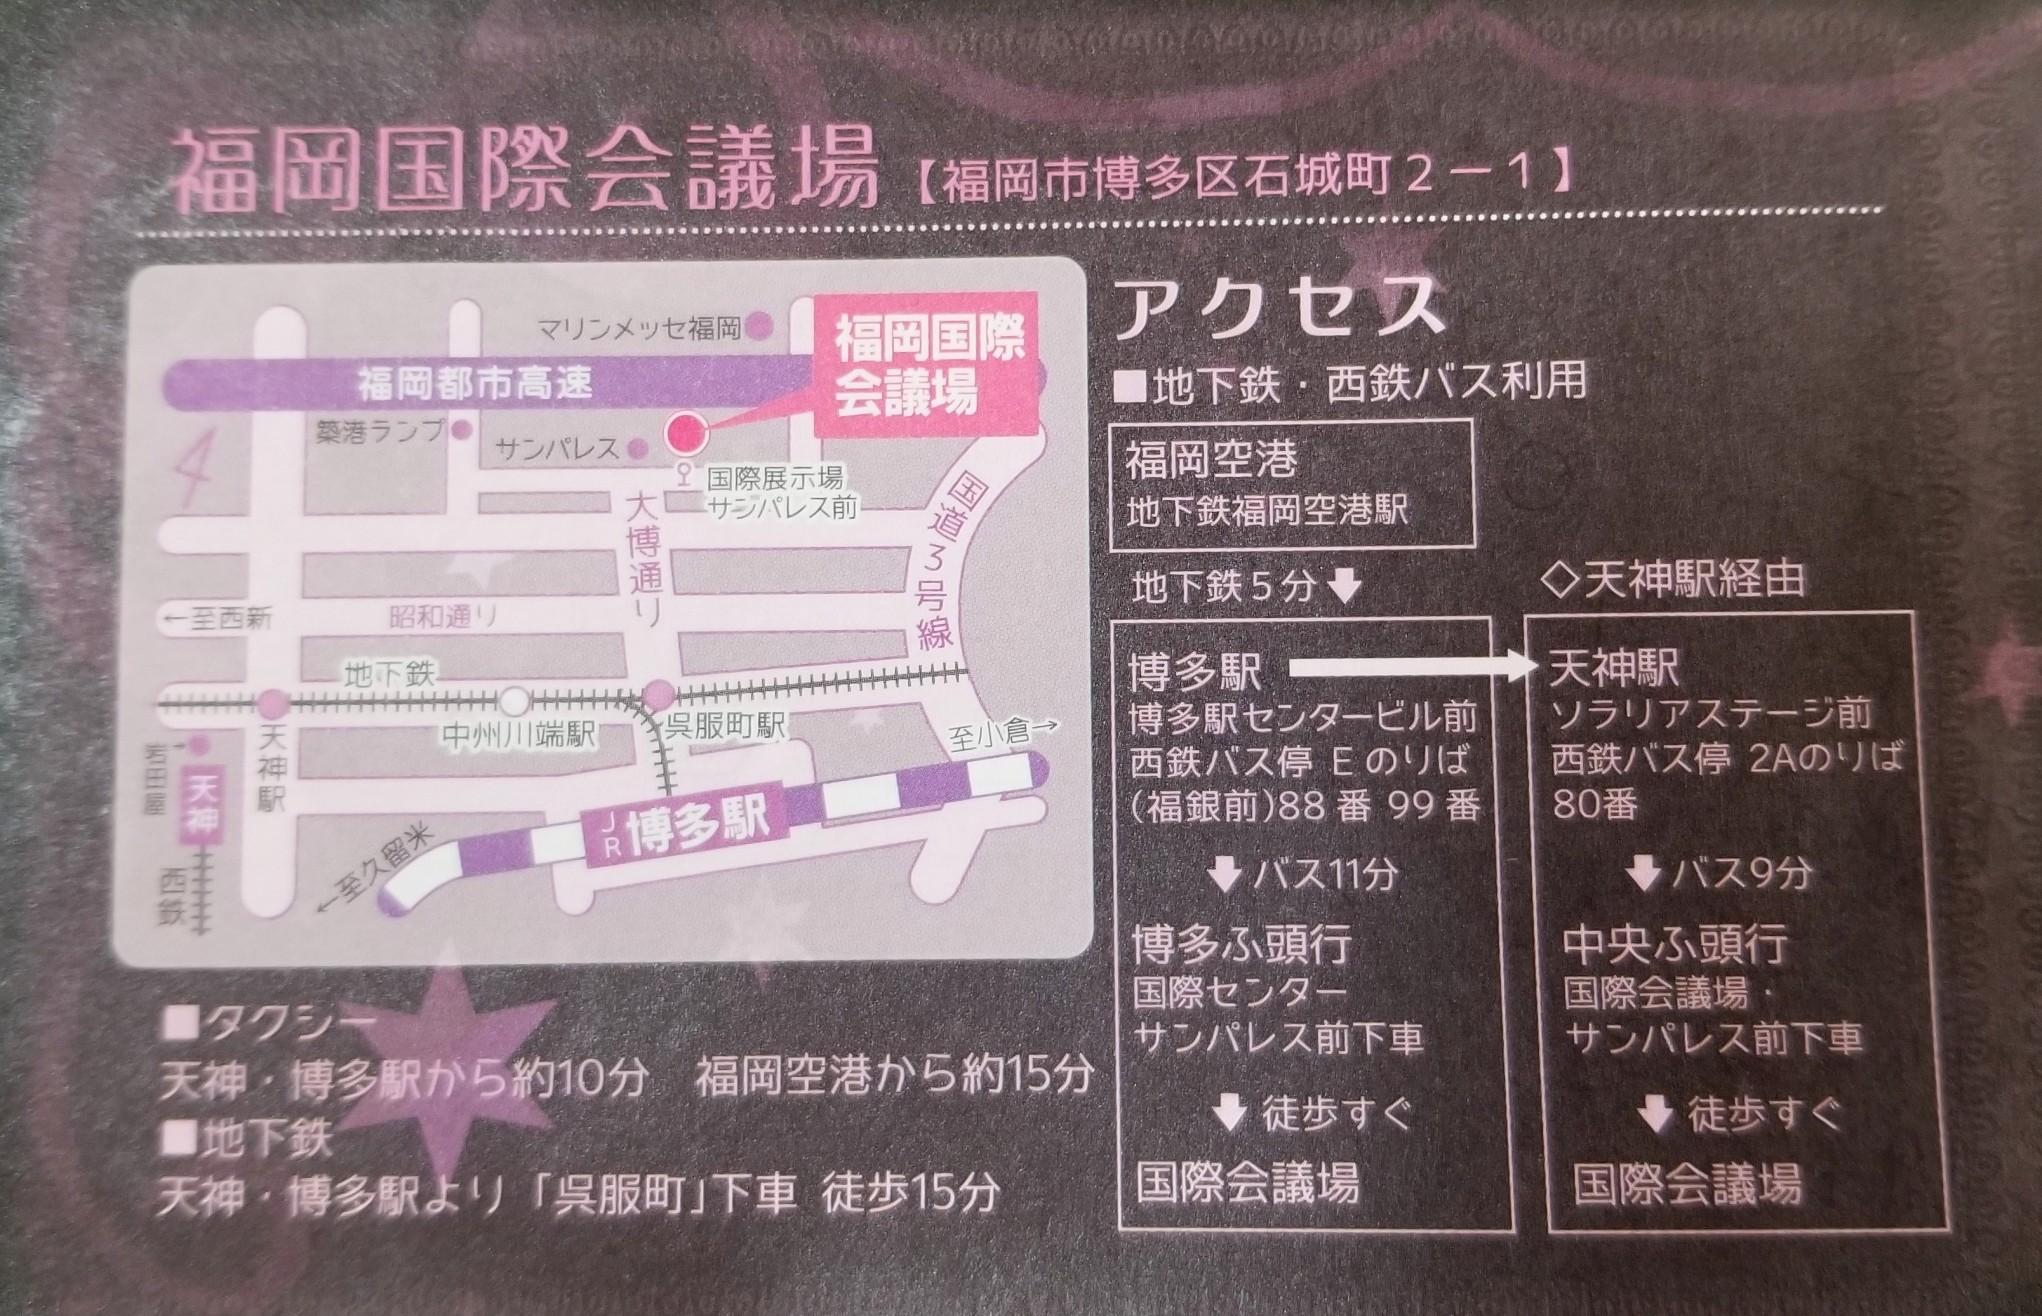 I・Doll, 福岡アイドール,開催場所,地図,福岡国際会議場,イベント